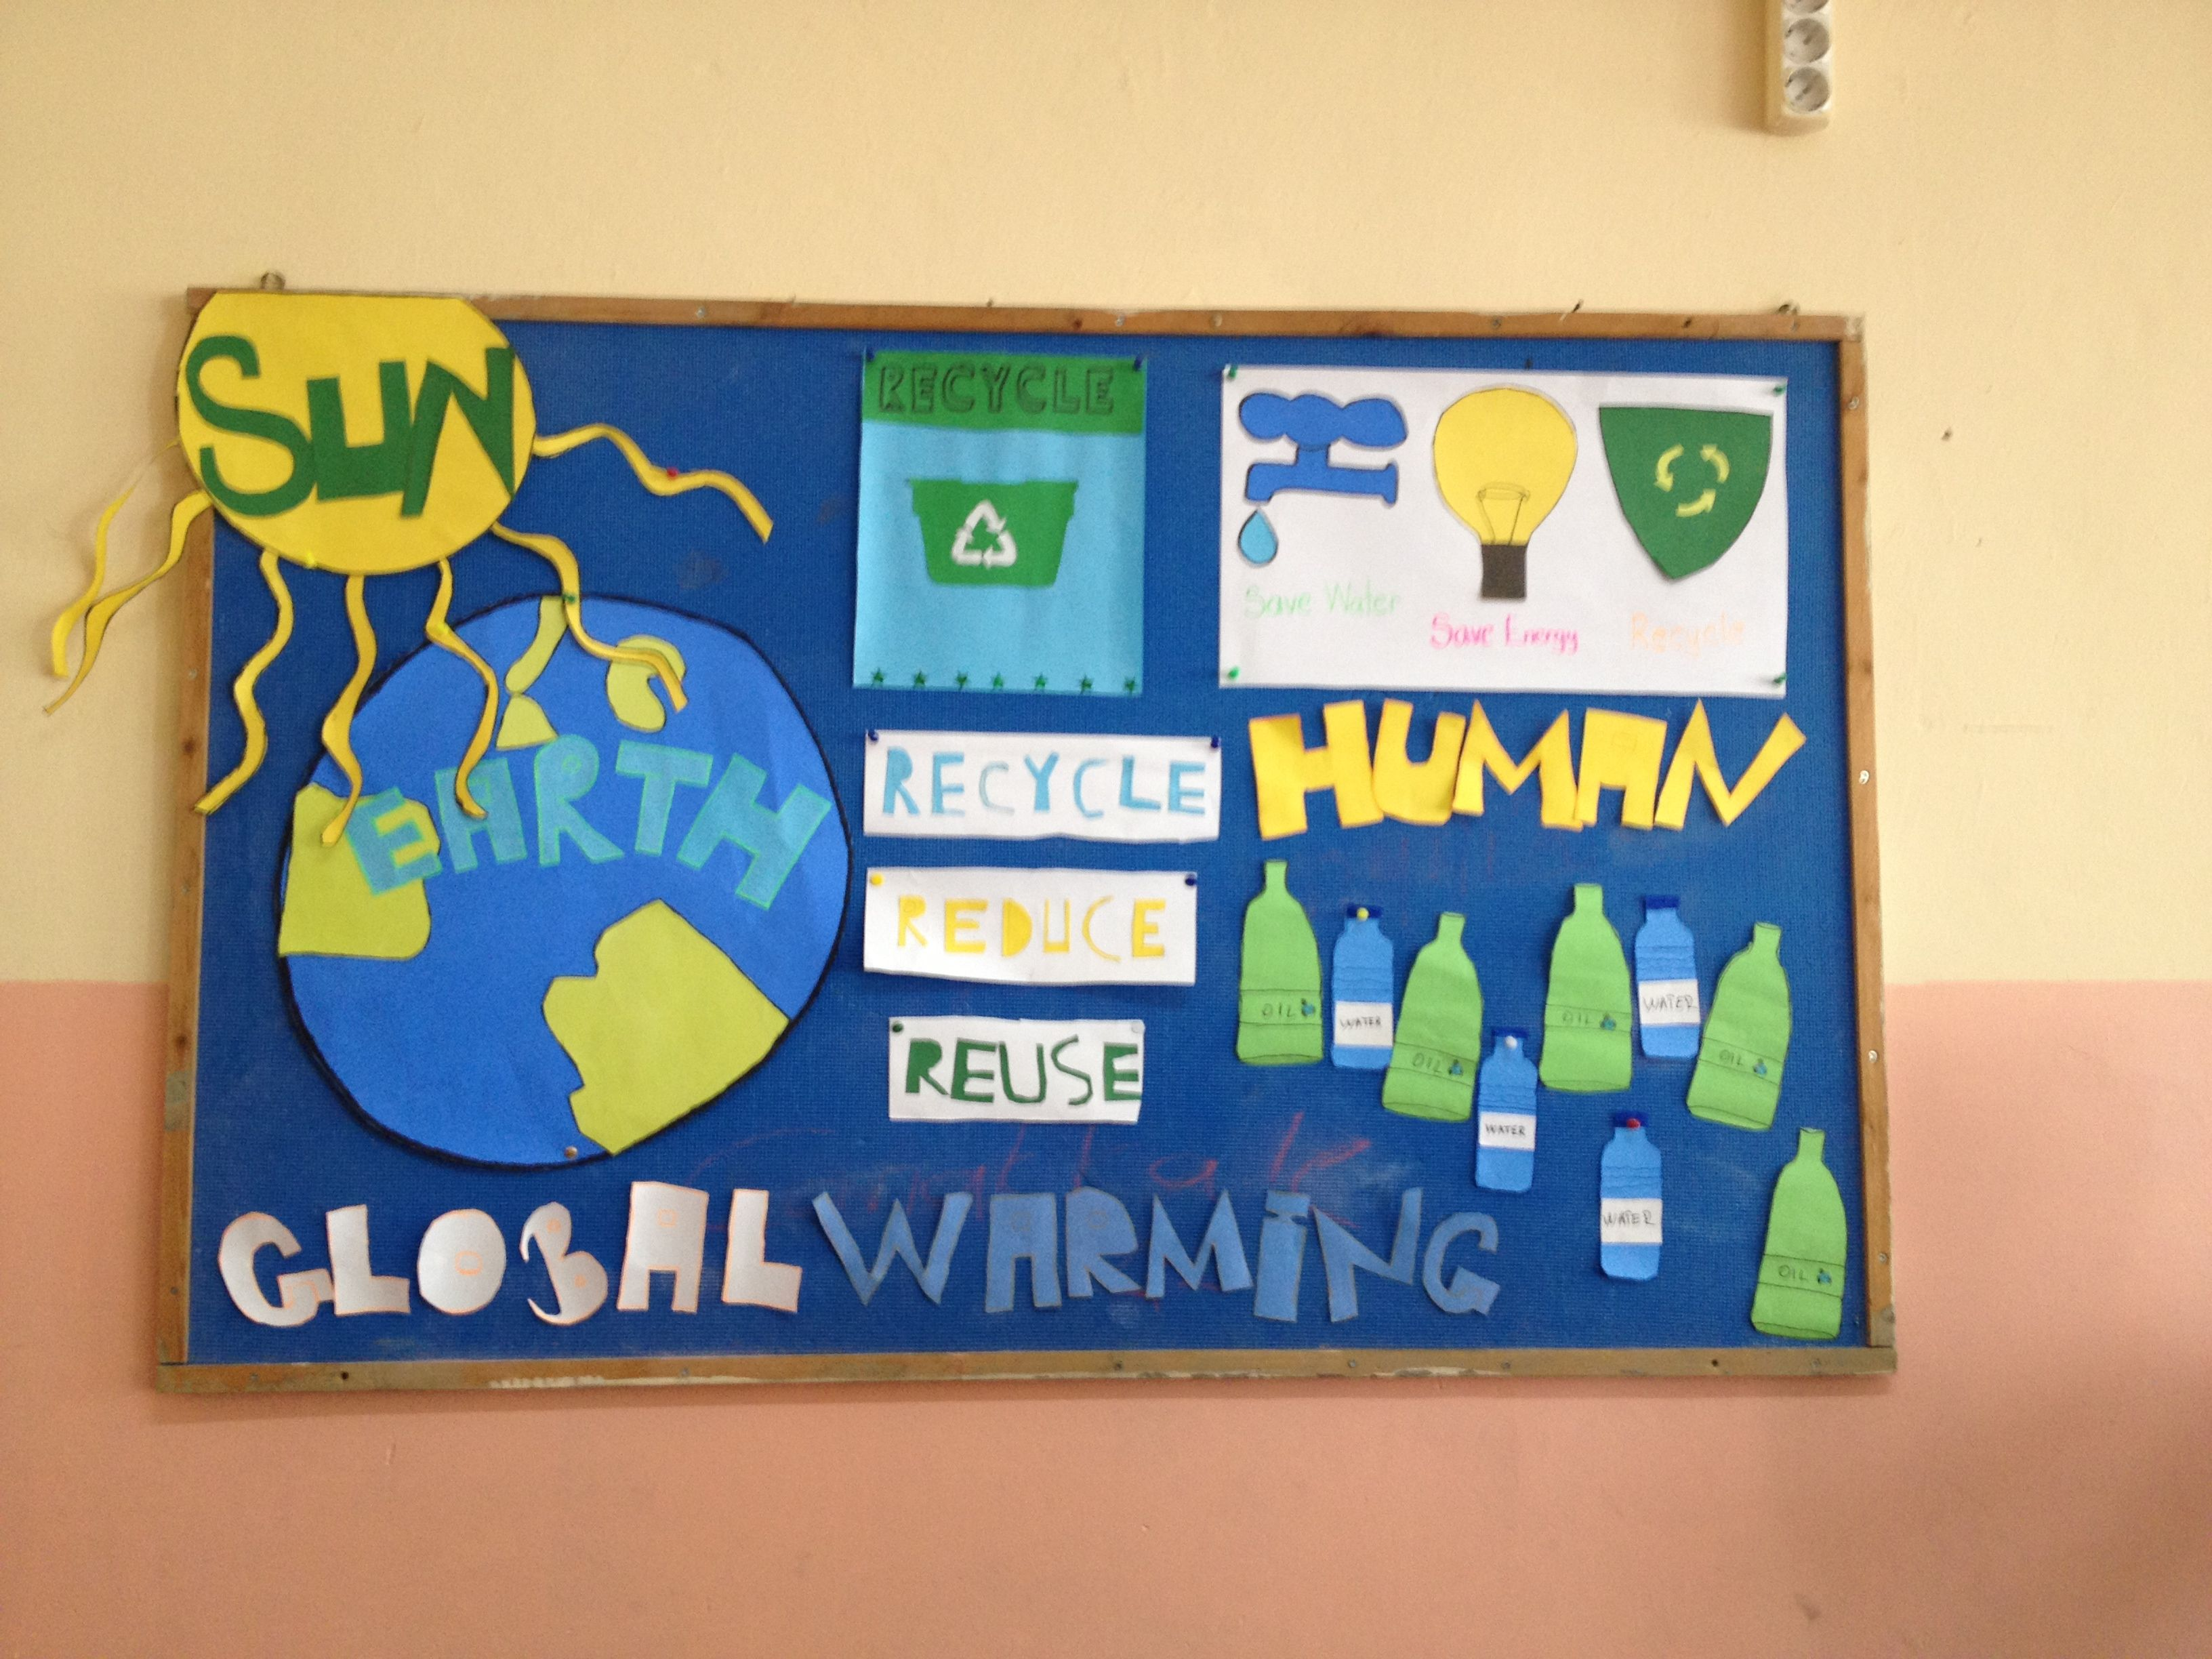 A bulletin board about global warming. Global warming